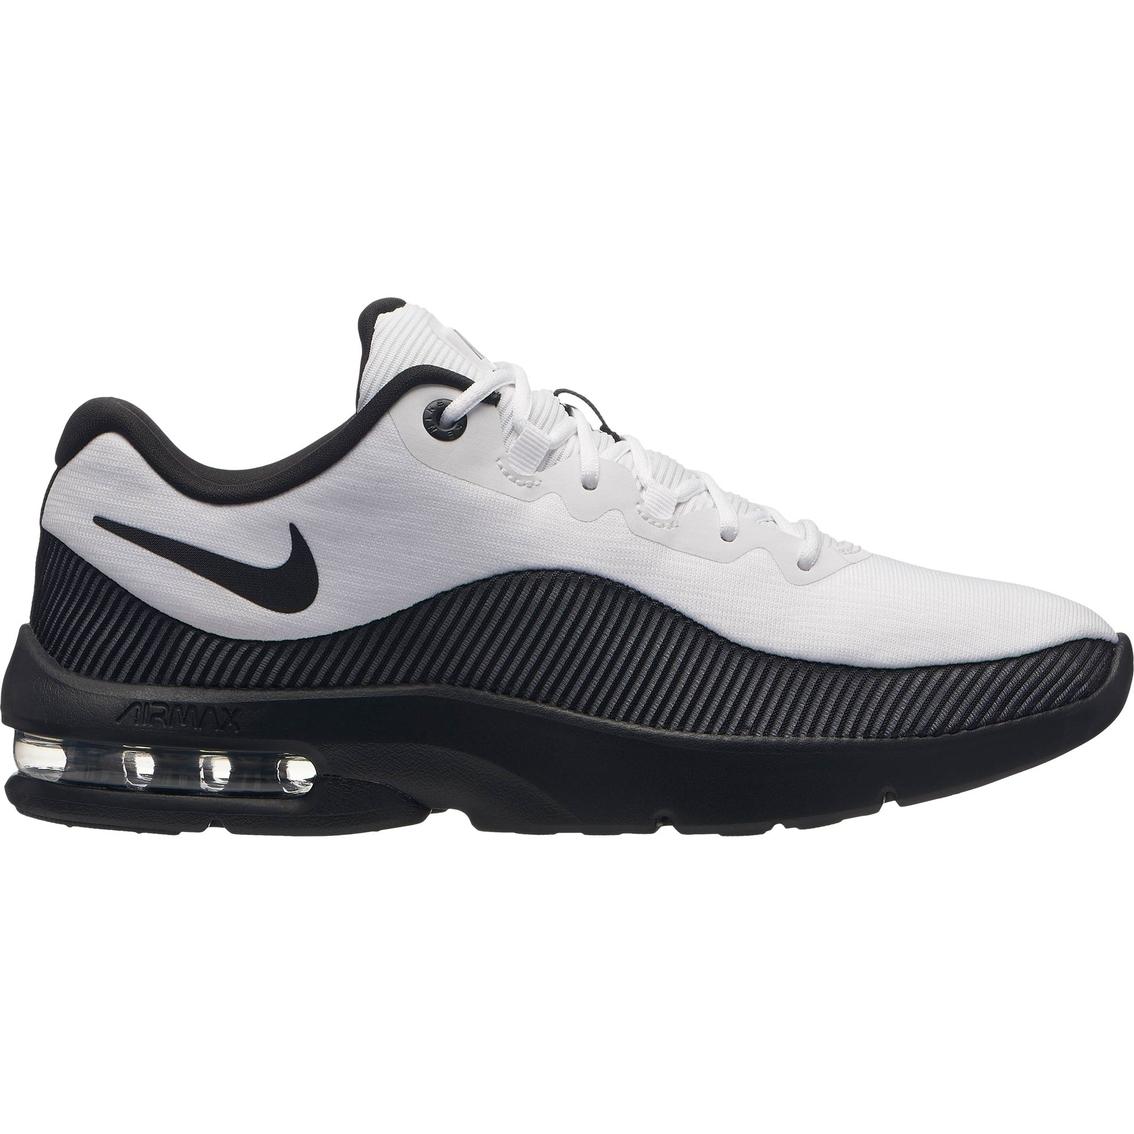 99dc9af7b78a Nike Women s Air Max Advantage 2 Running Shoes